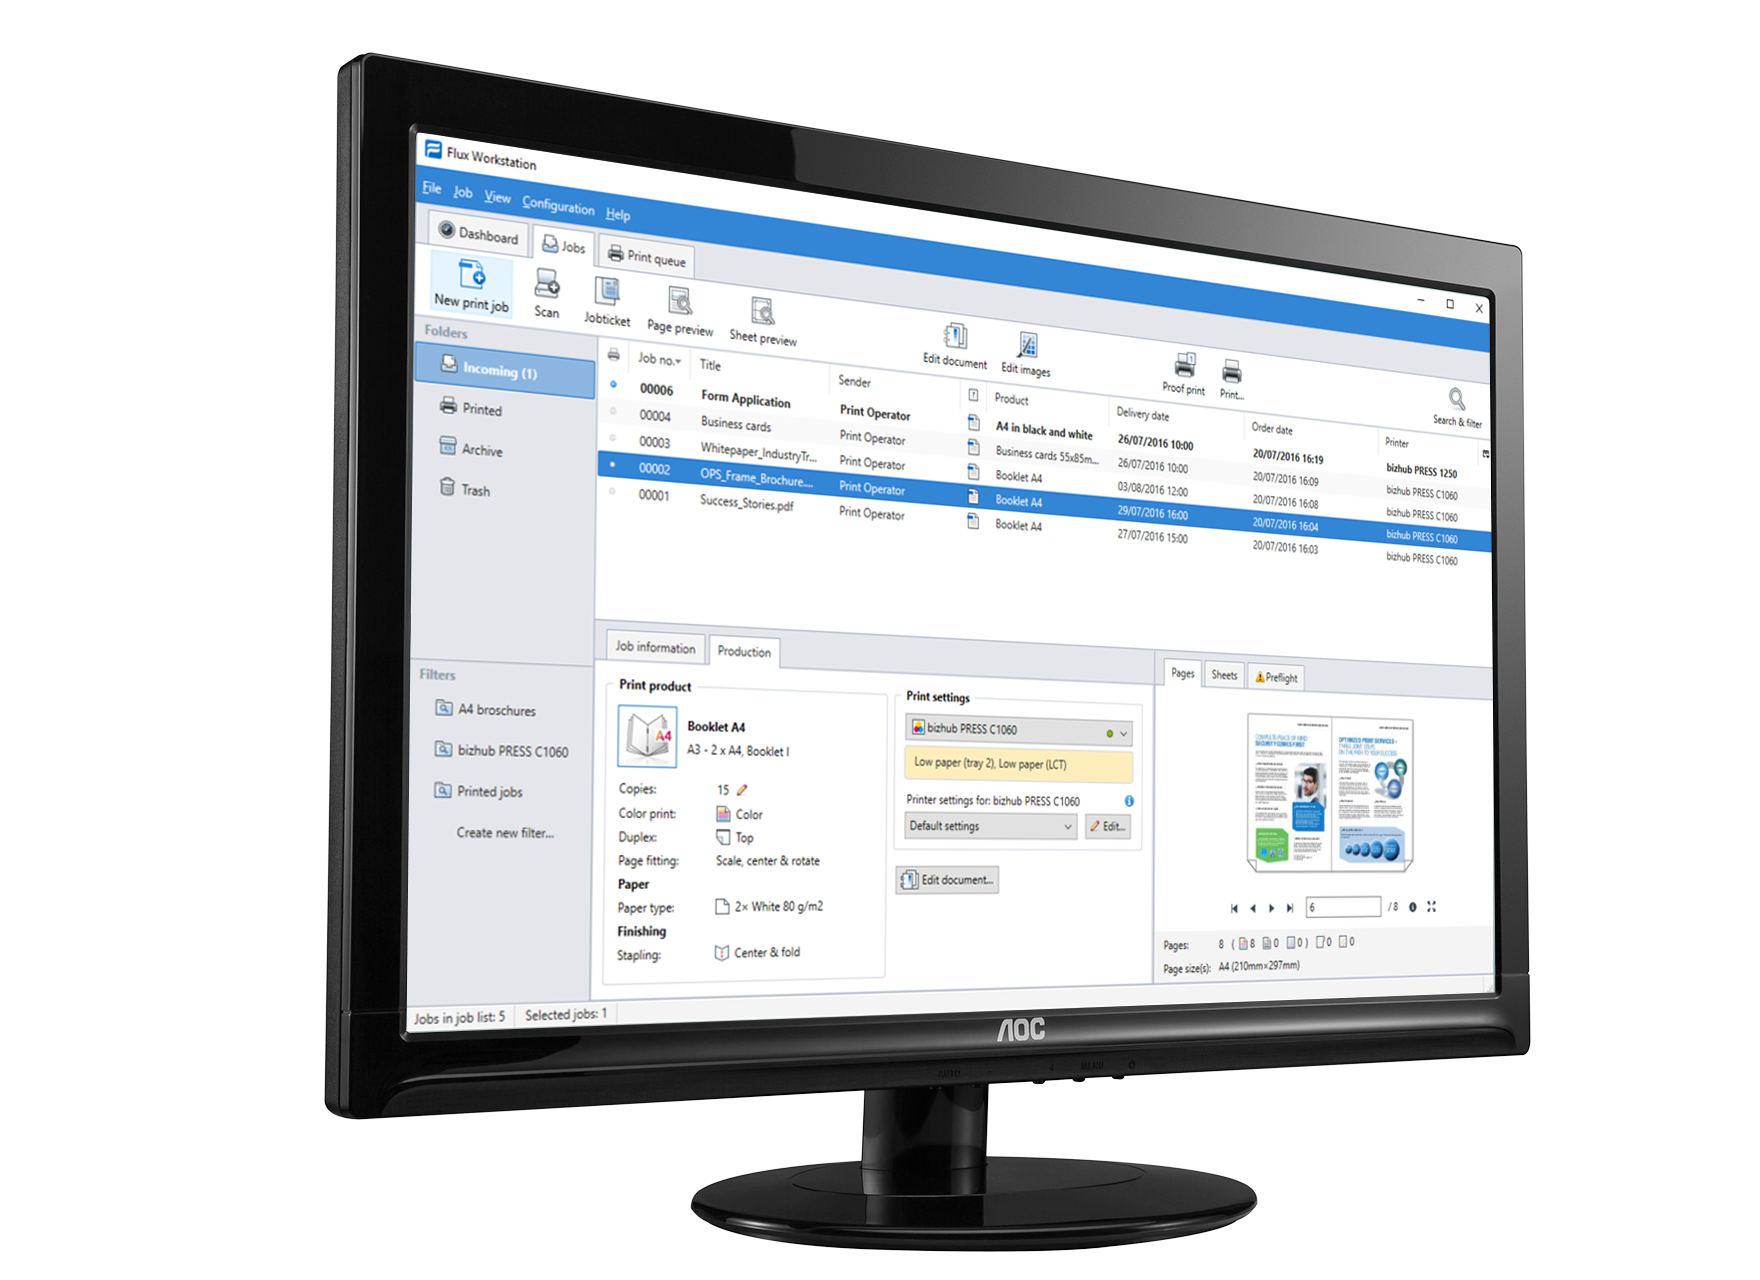 MIS integration Konica Minolta screenshot on computer screen